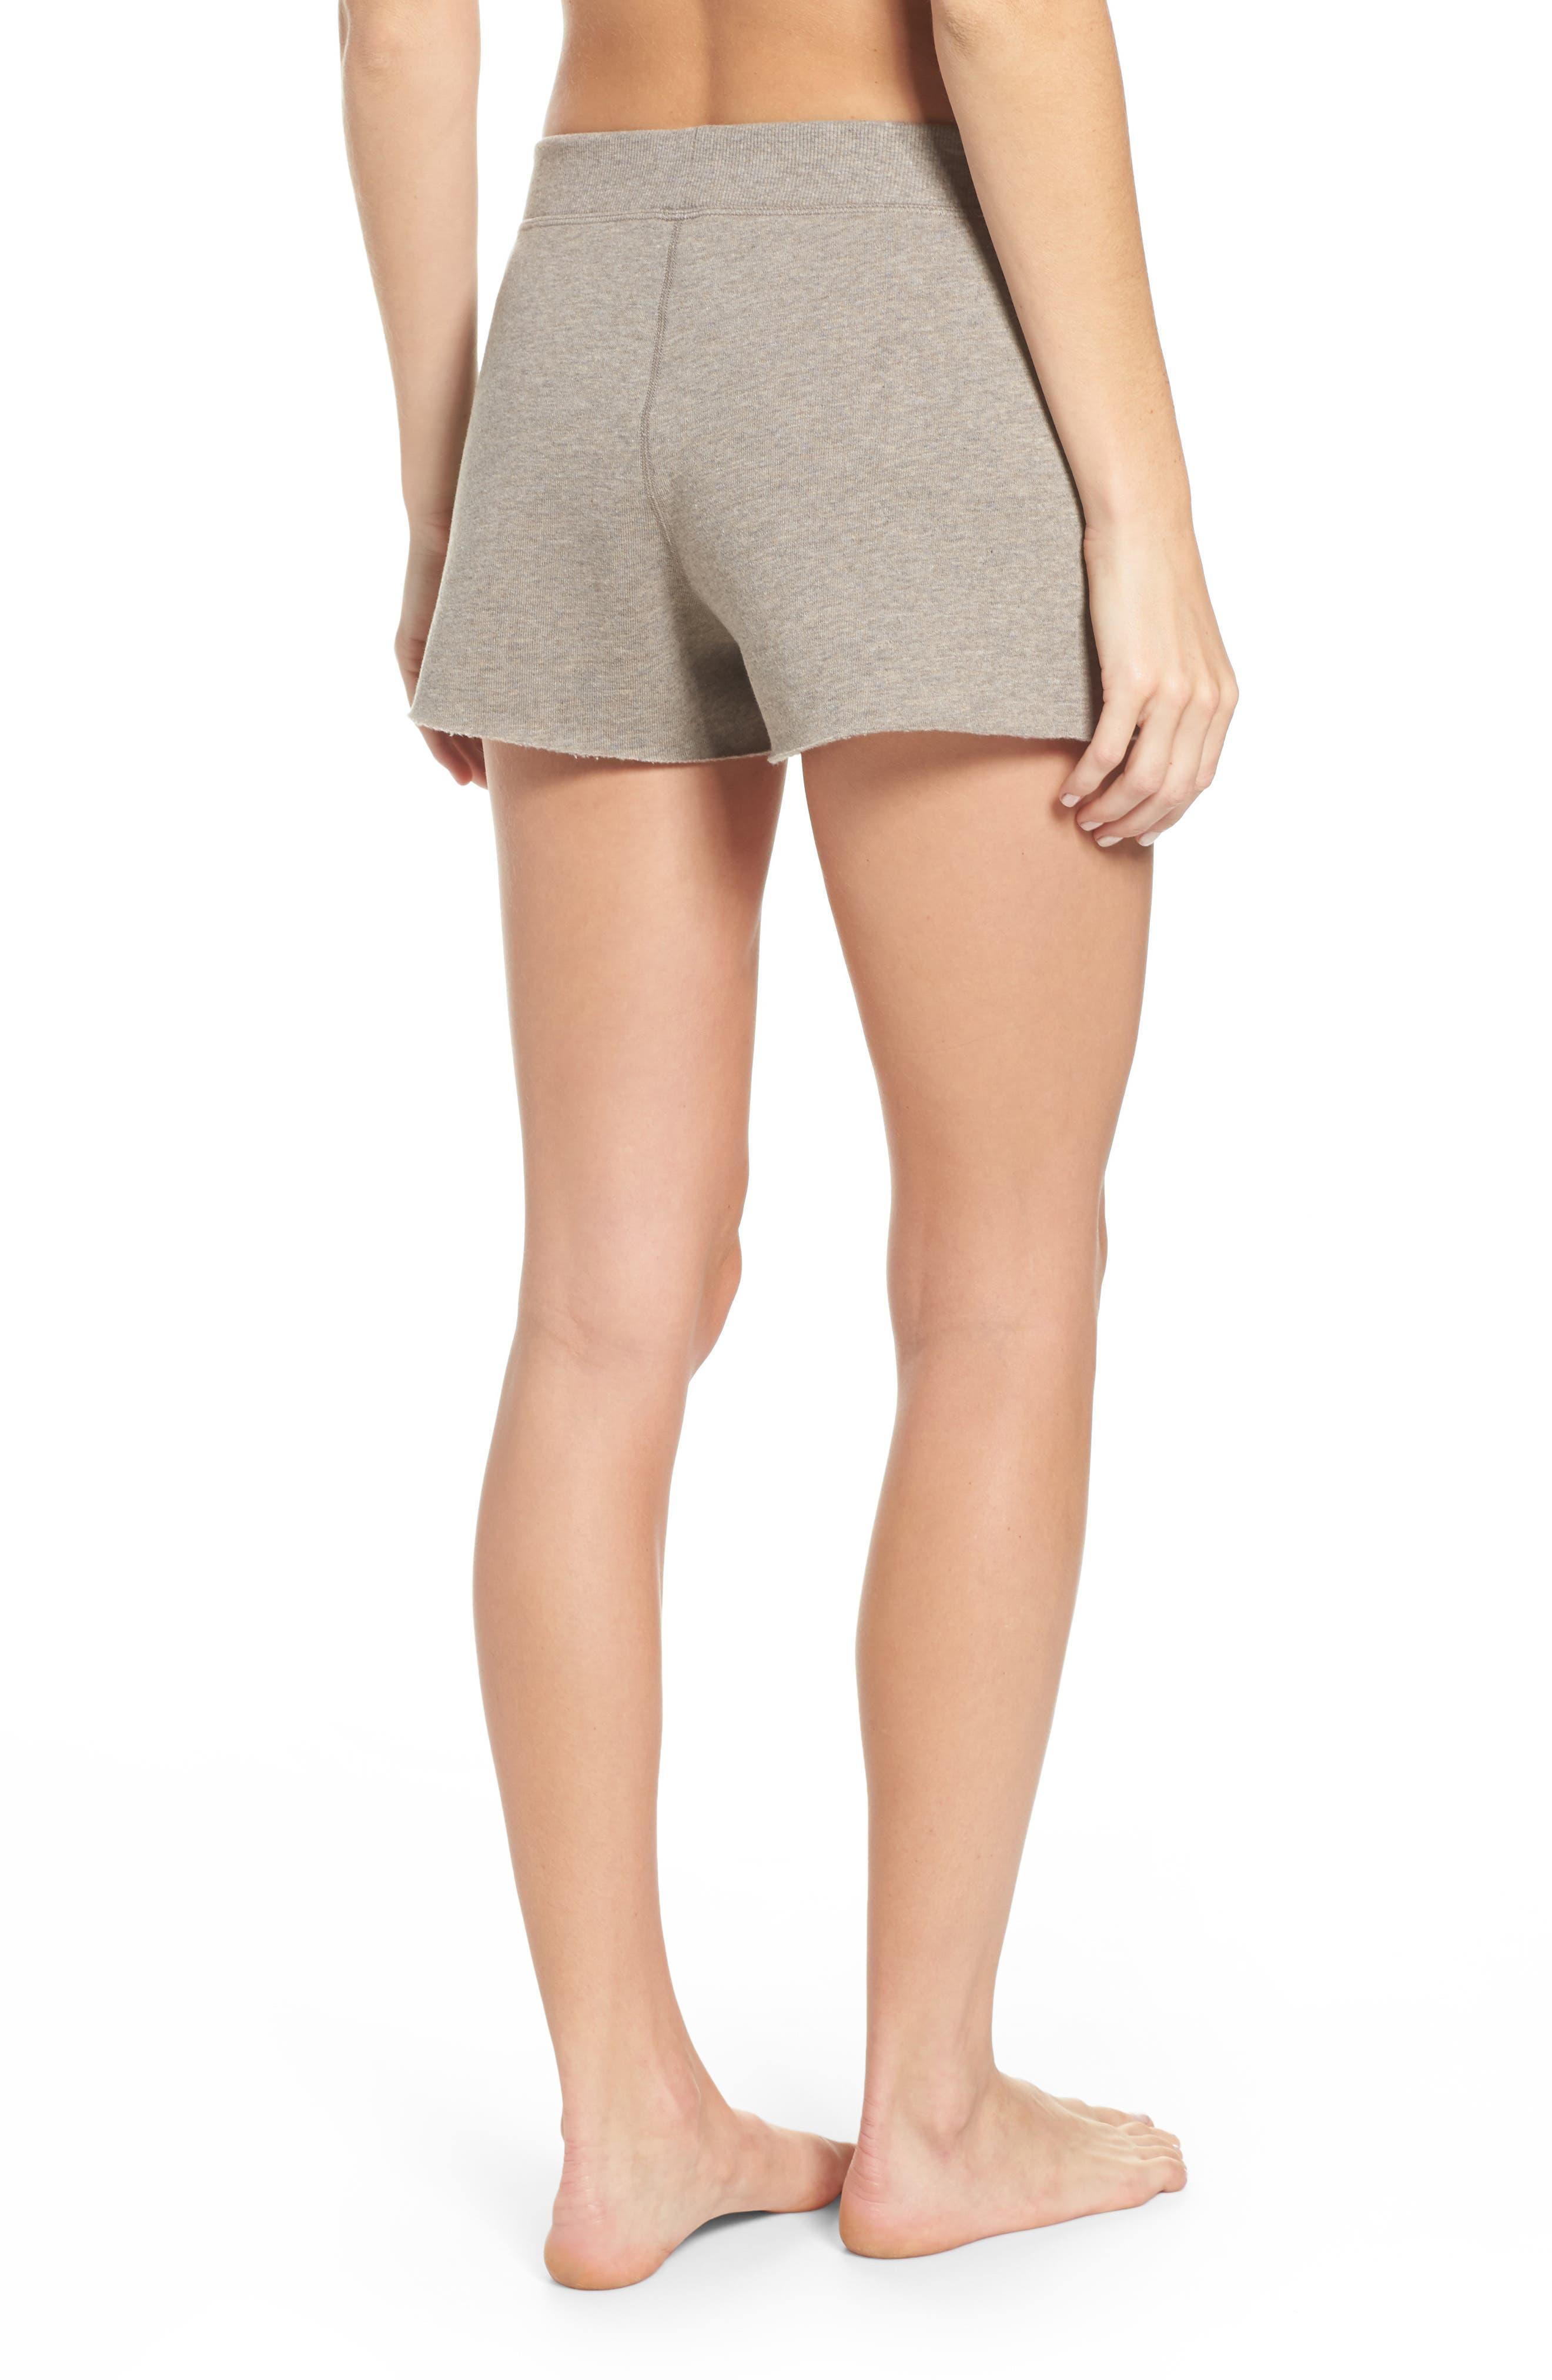 Slay Shorts,                             Alternate thumbnail 2, color,                             Gravel Heather